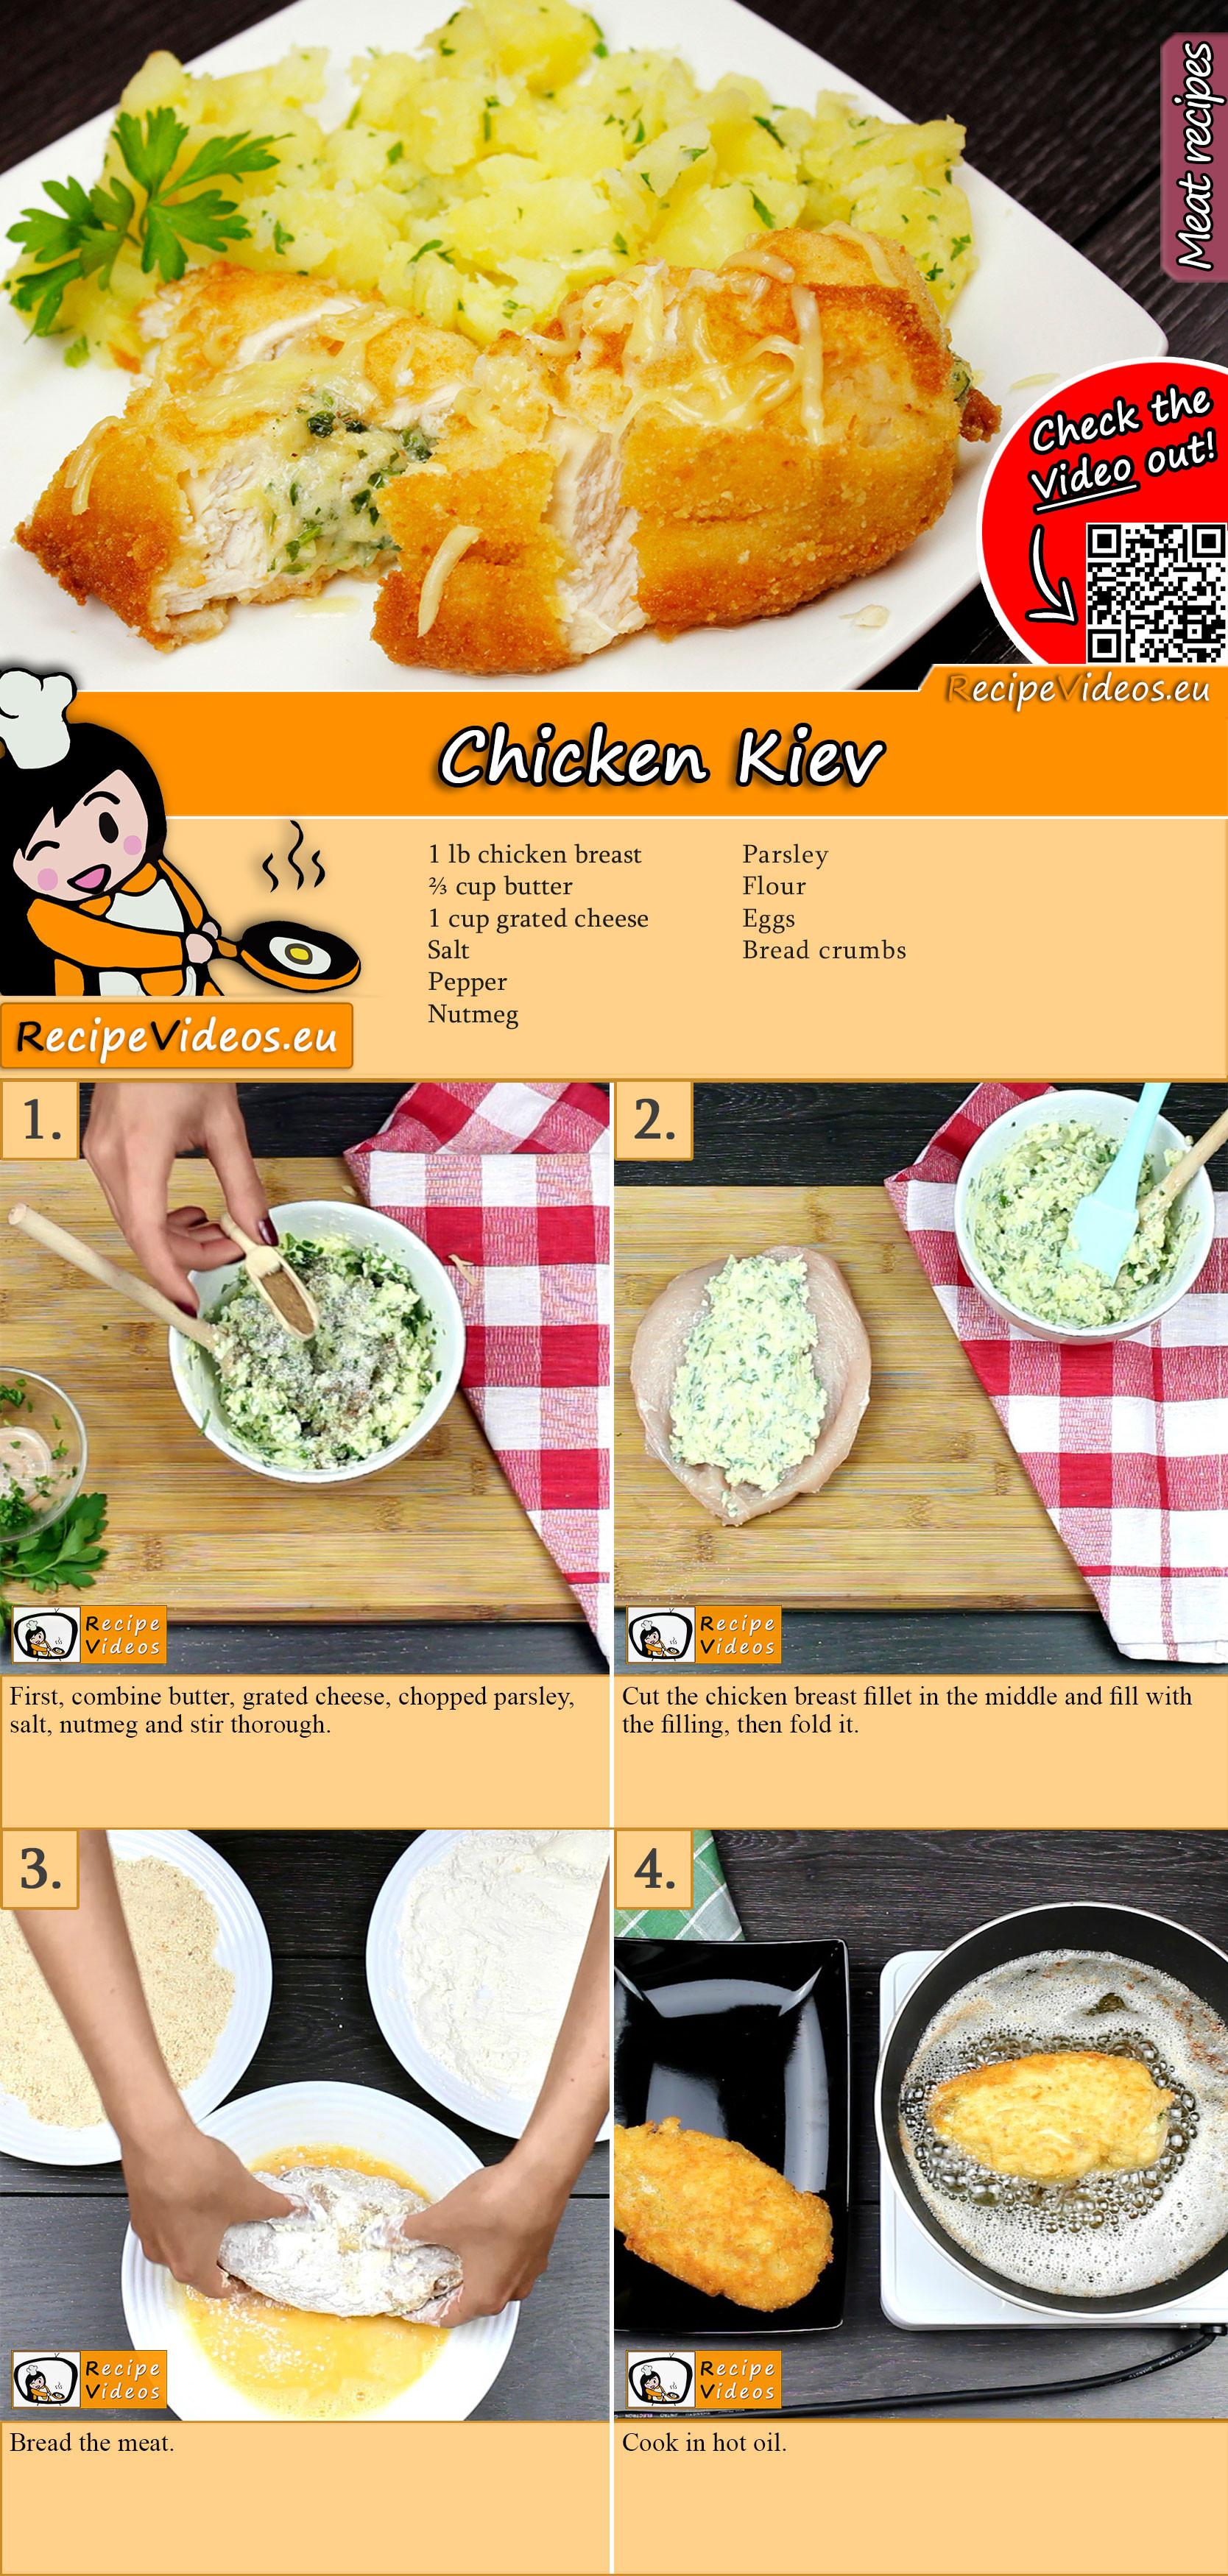 Chicken Kiev recipe with video